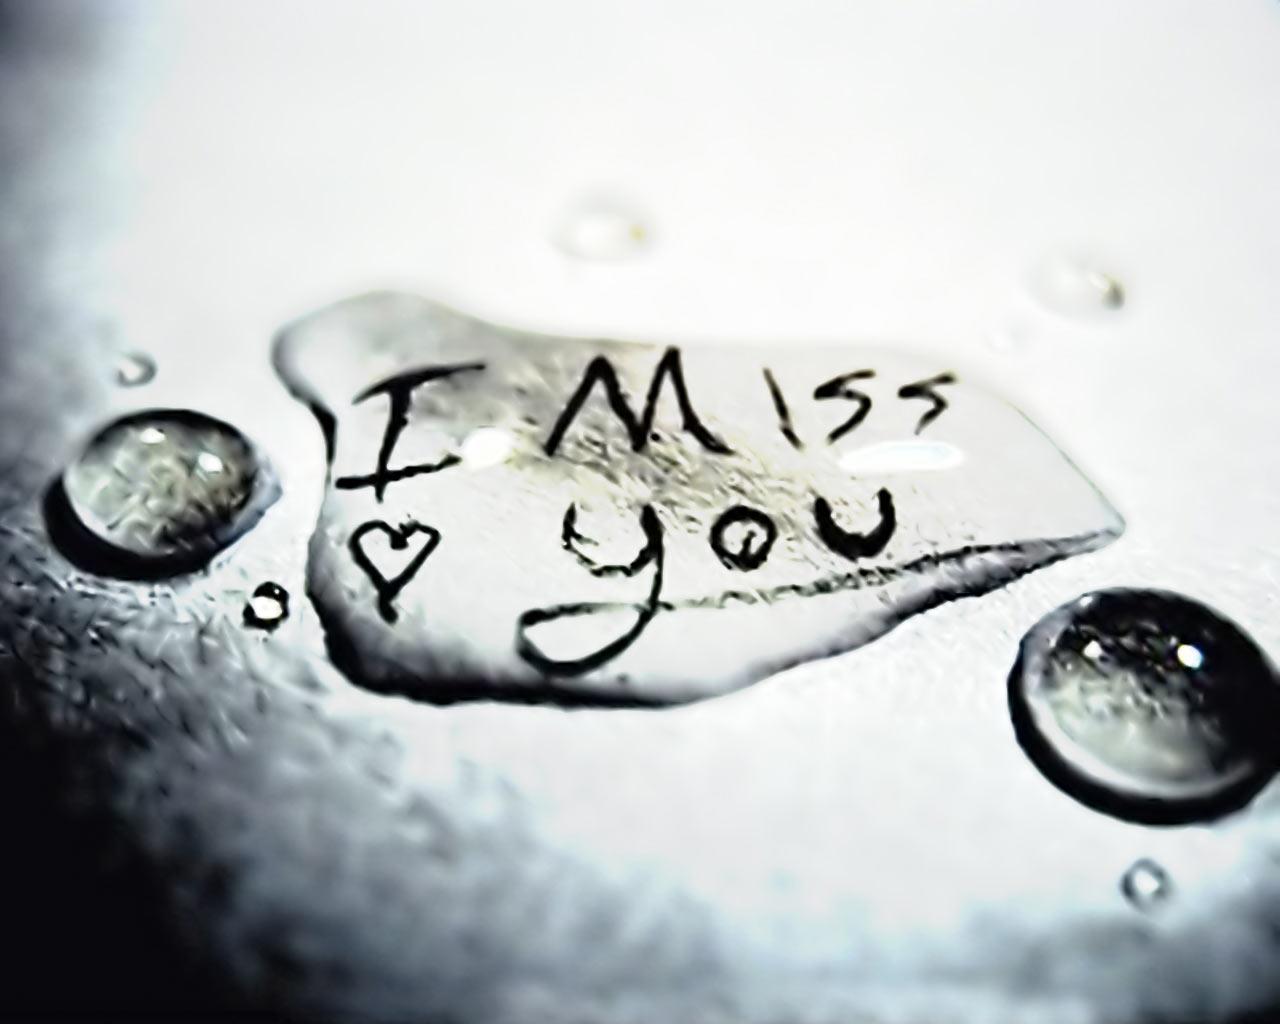 http://3.bp.blogspot.com/-4BzbNKH_QHE/UPYdVhxioBI/AAAAAAAACgc/AX2G9Y3z6cw/s1600/I_Miss_you-I_miss_U+(2).jpg